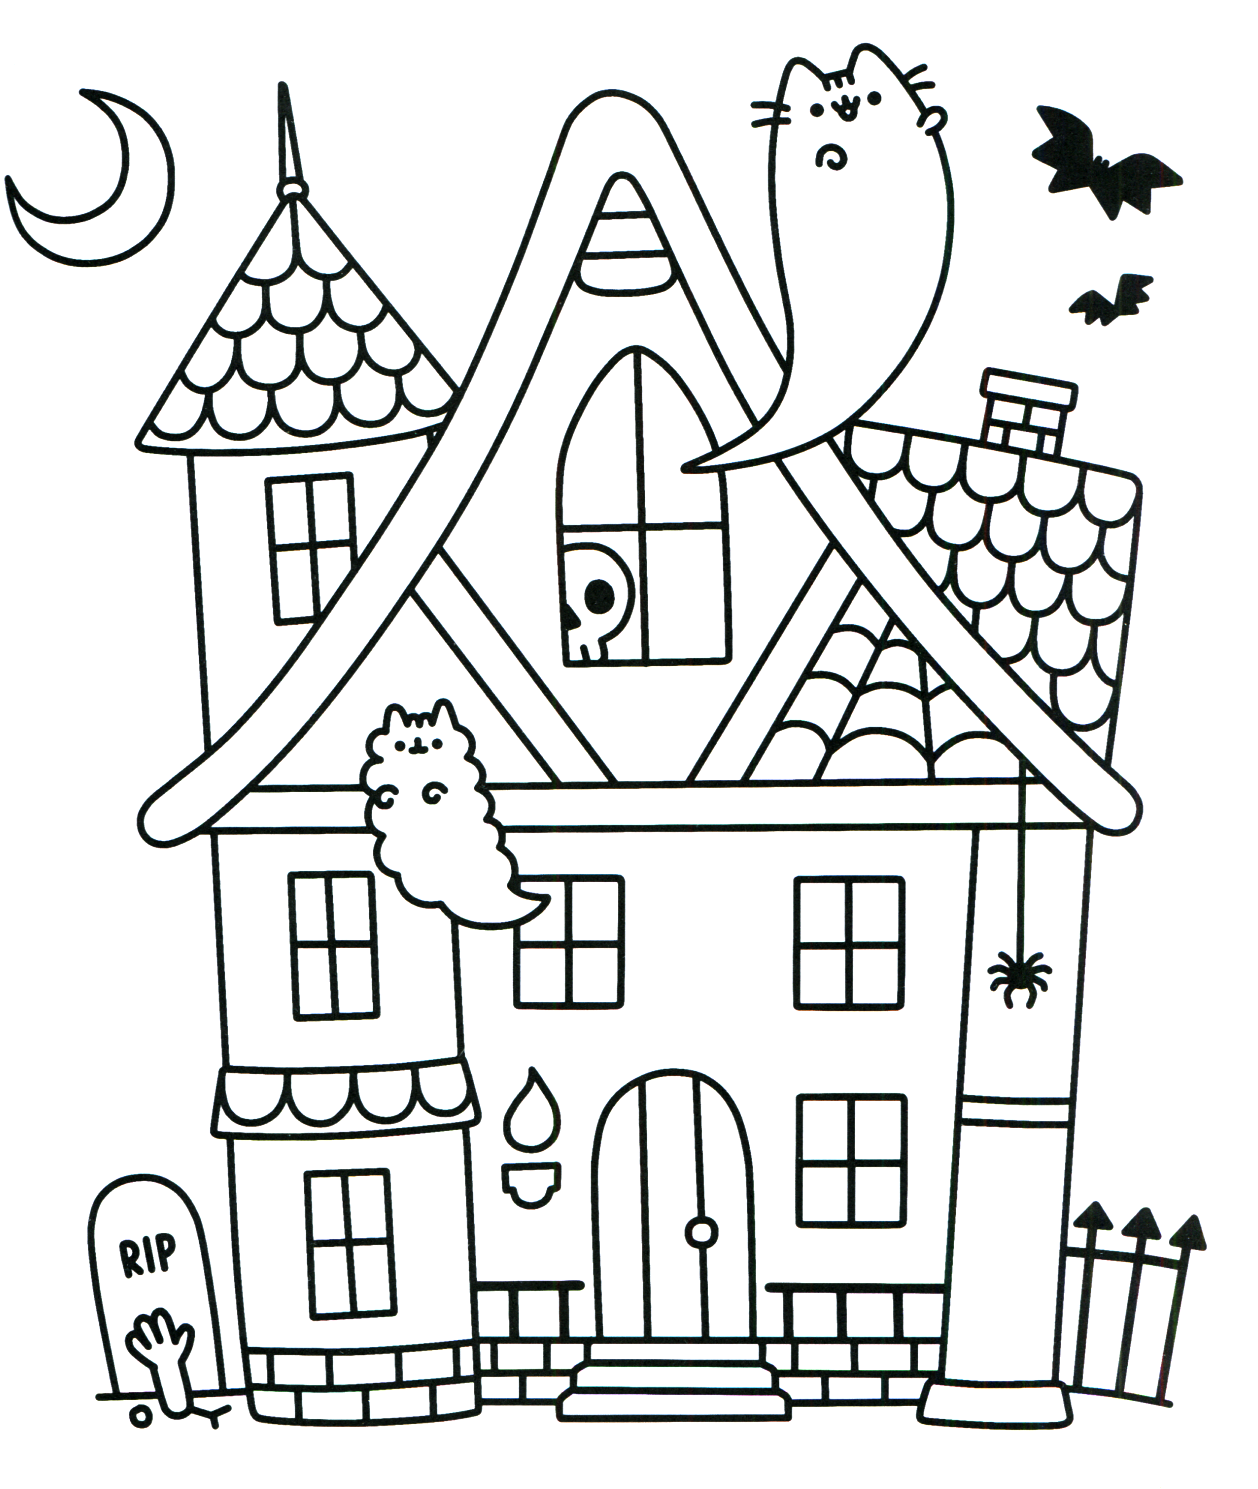 Pusheen Coloring Book Pusheen Pusheen the Cat | 適当2 | Pinterest ...